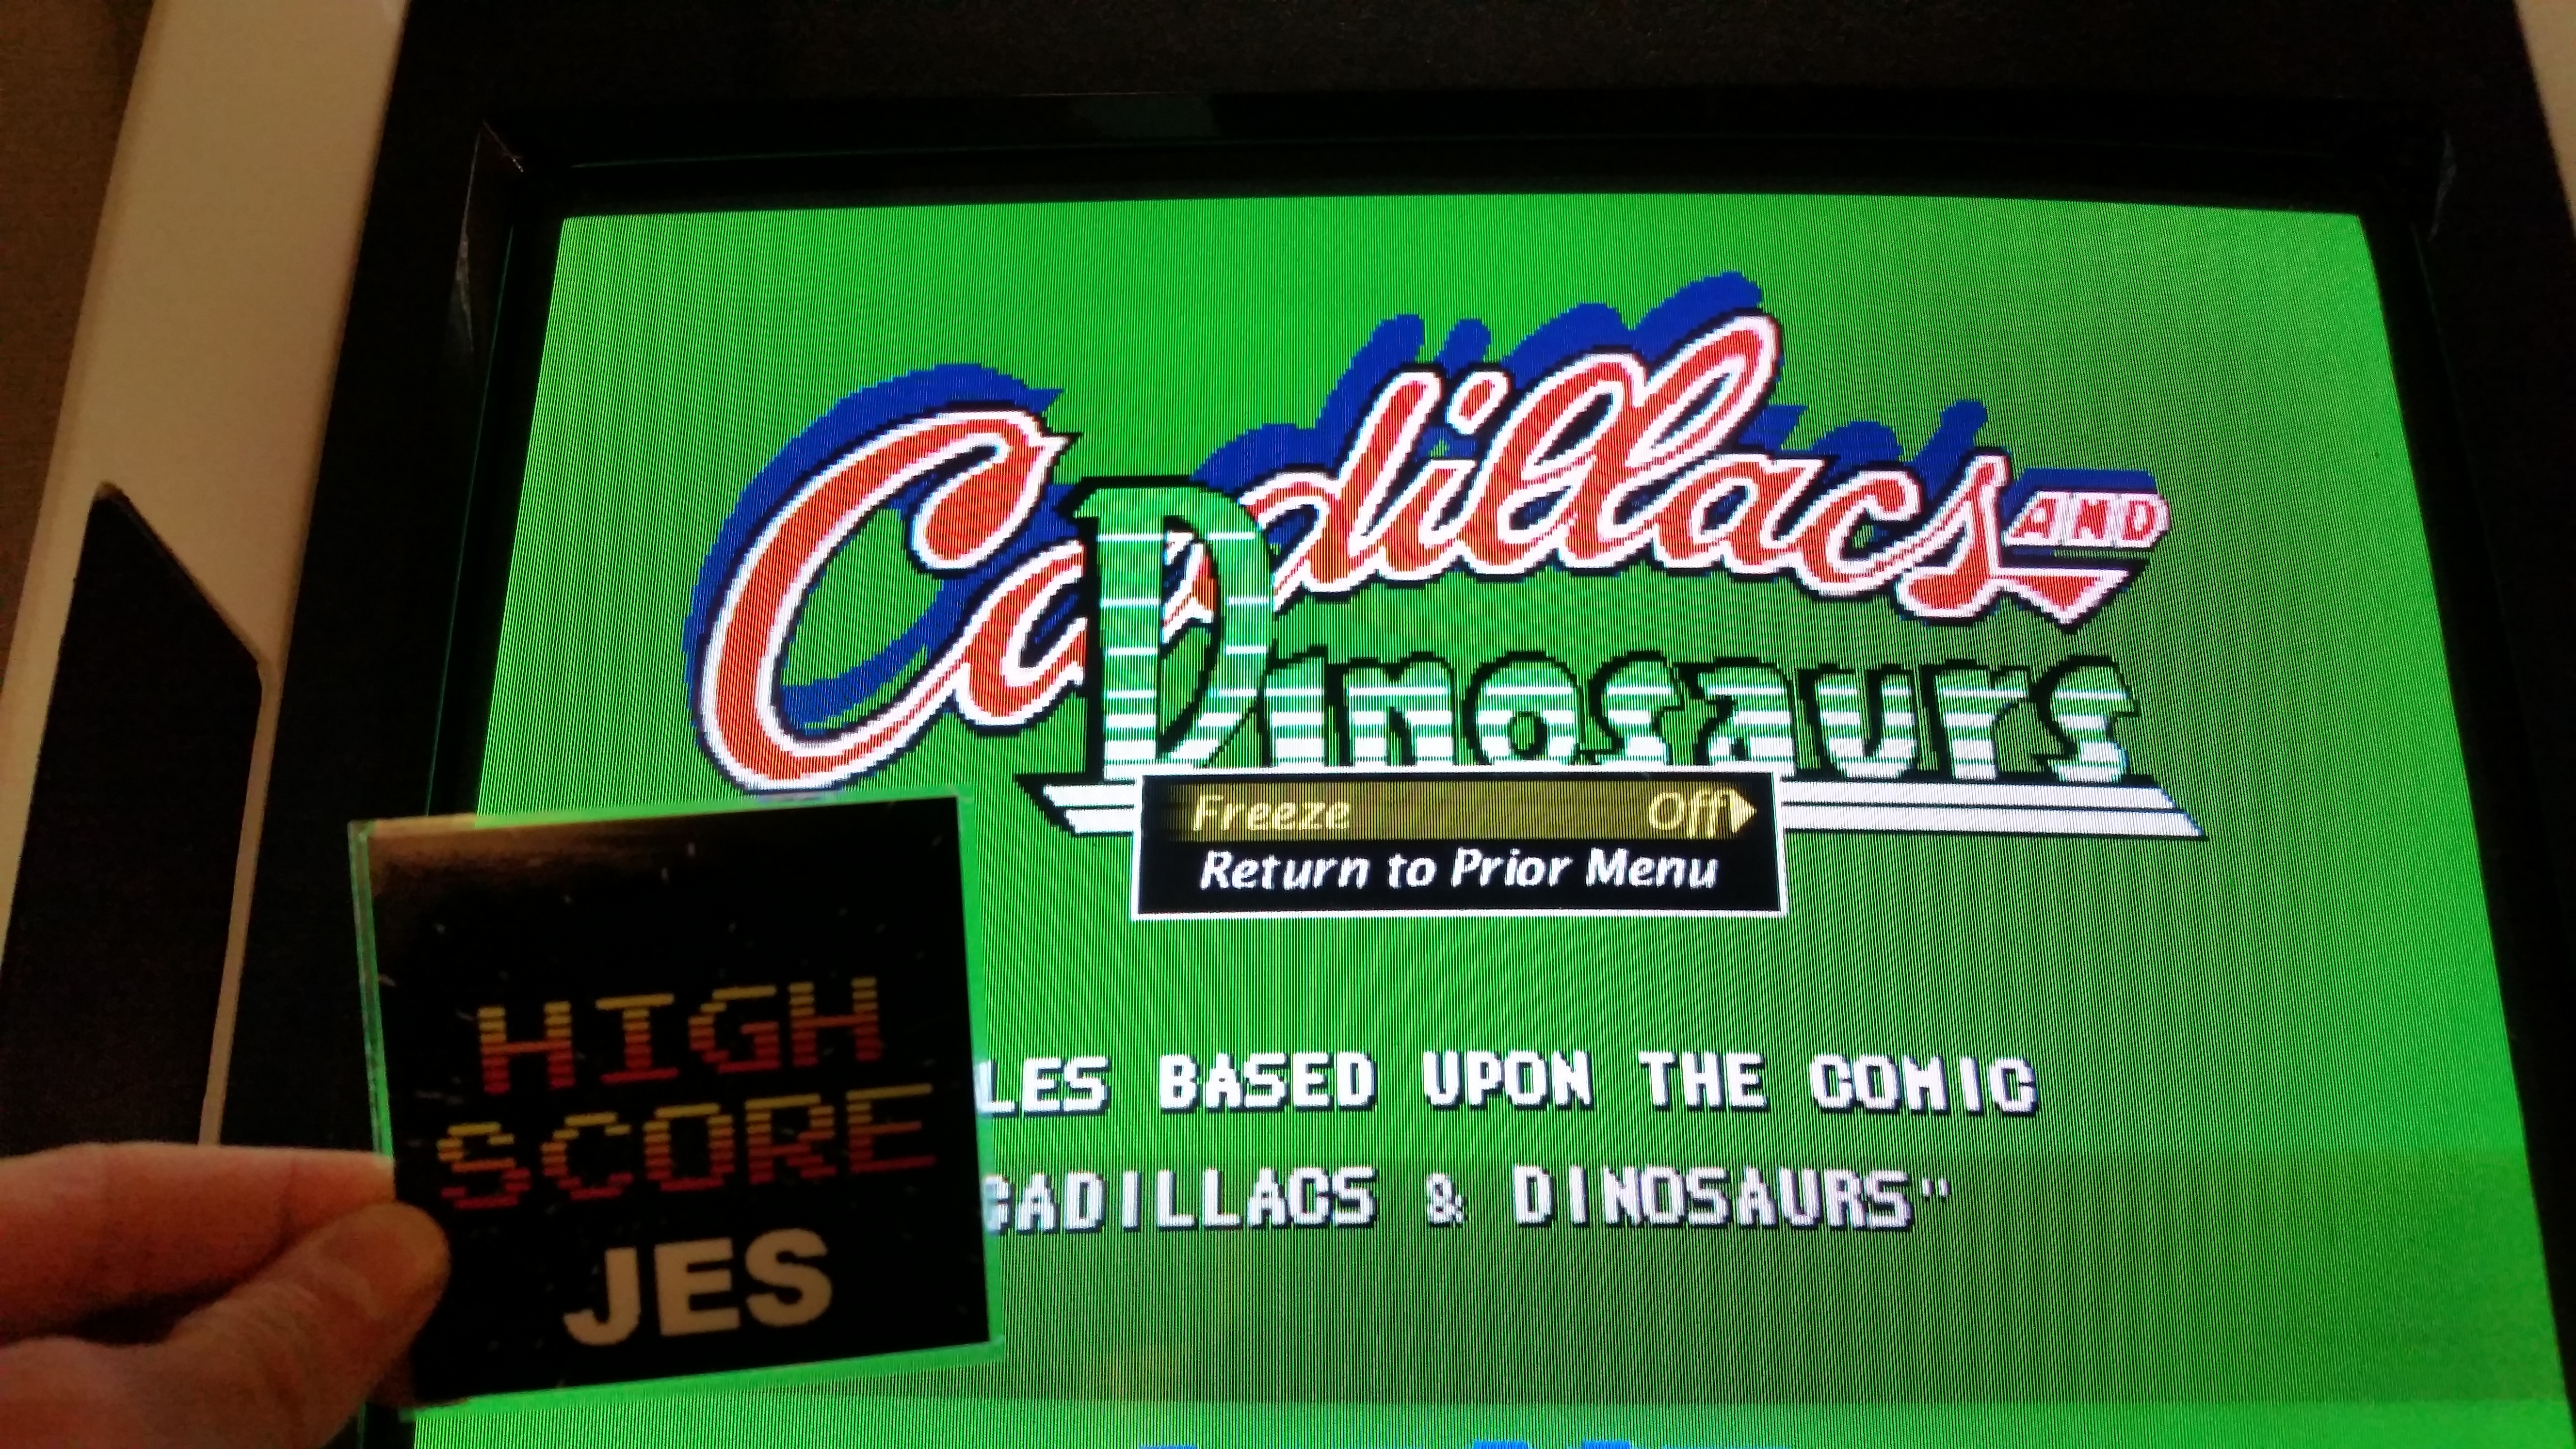 Cadillacs and Dinosaurs [dino] 100,800 points